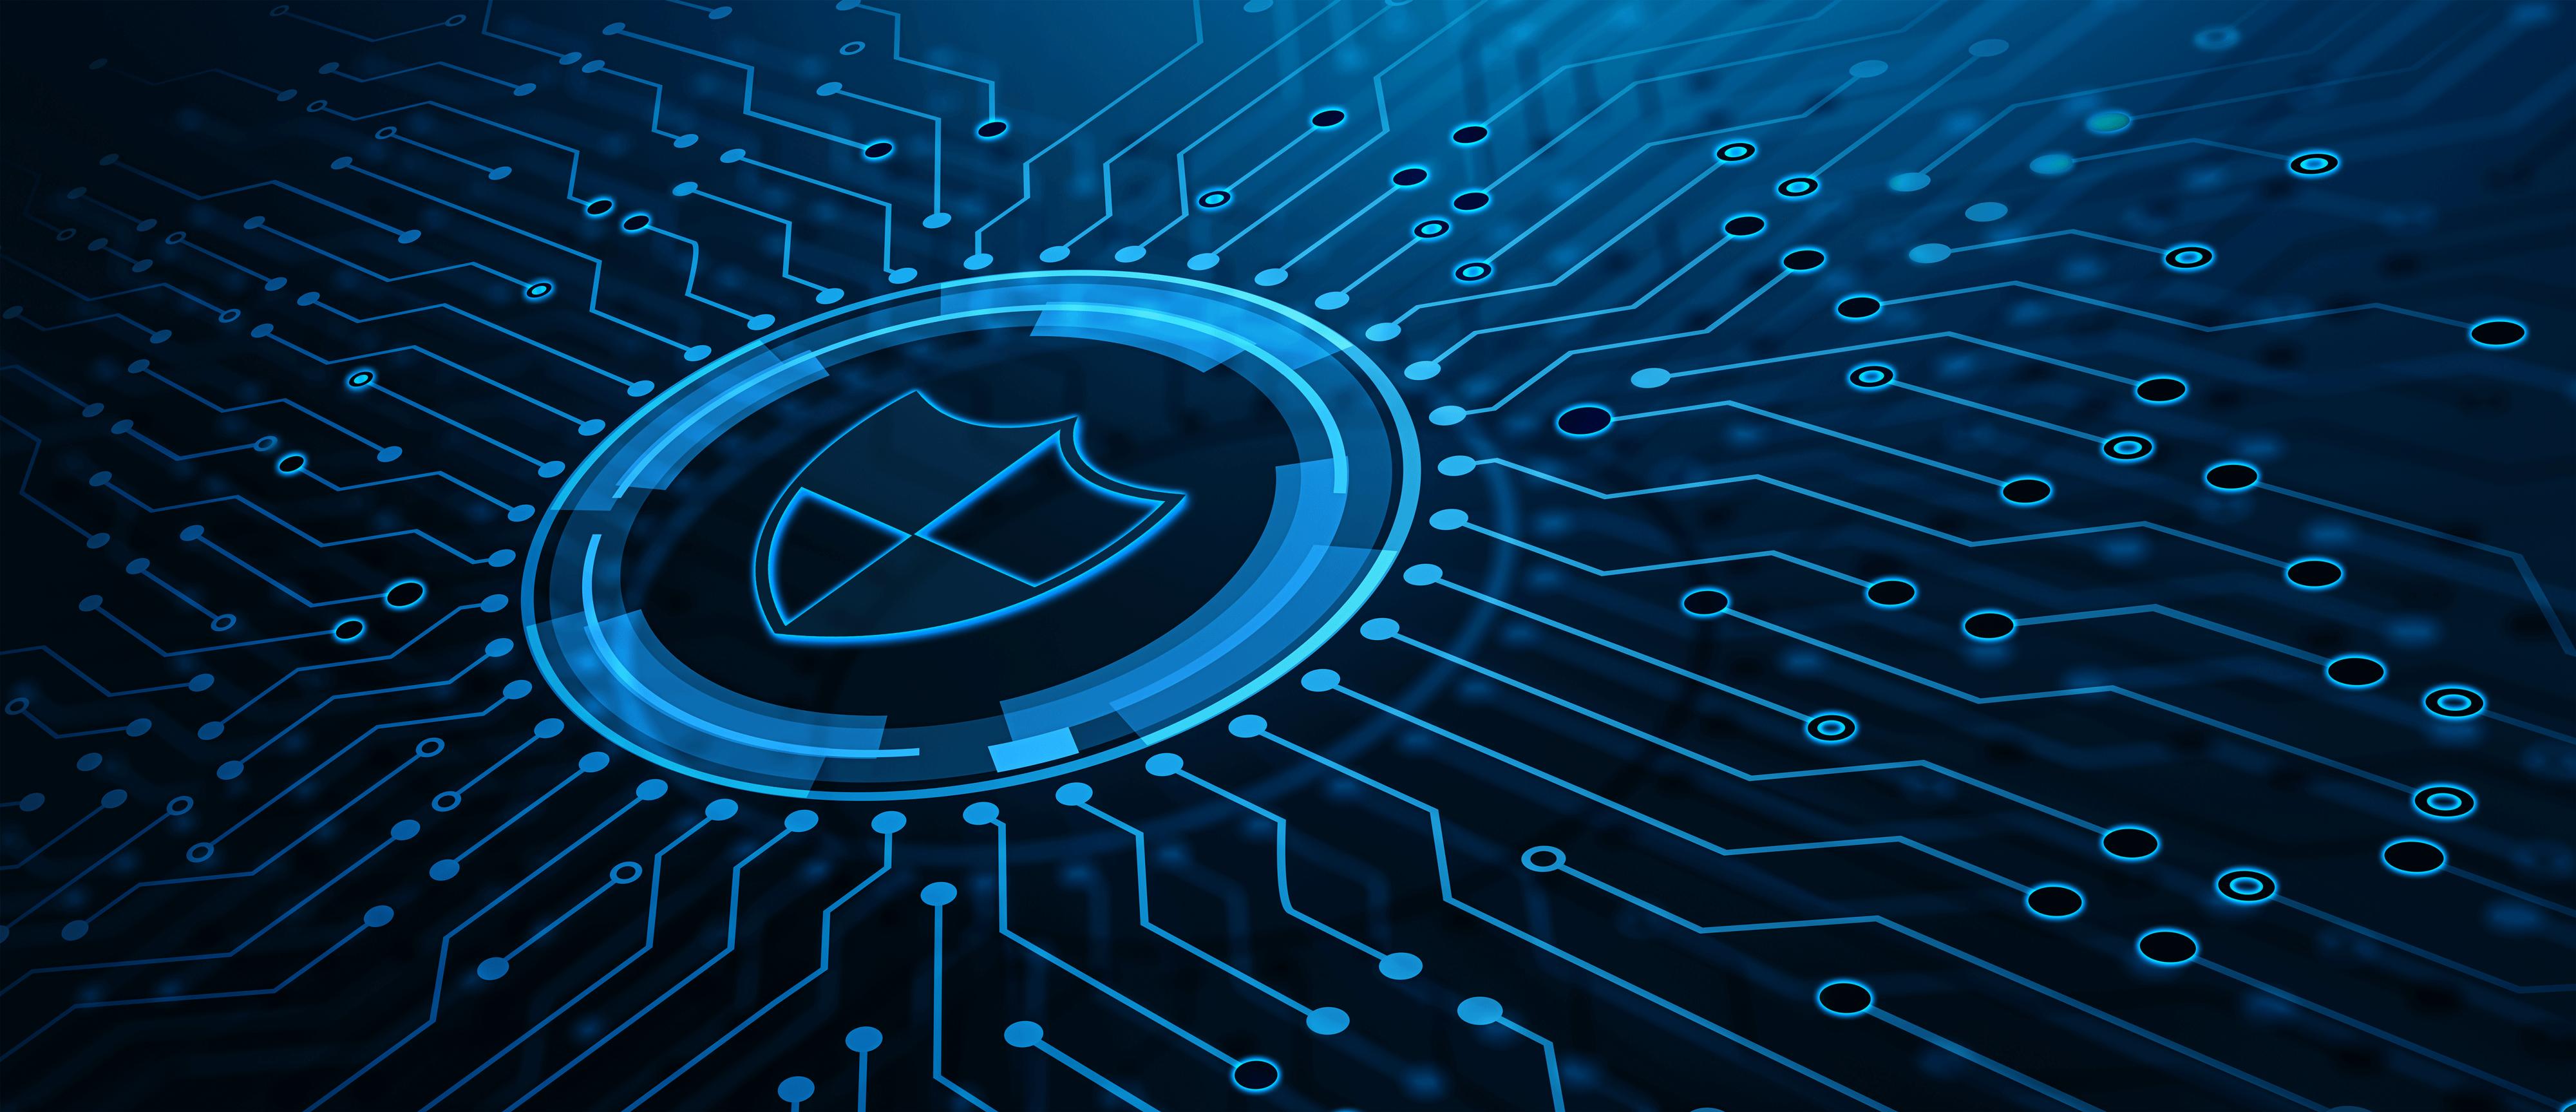 Dahua Technology Cyberbeveiligingsaanpak